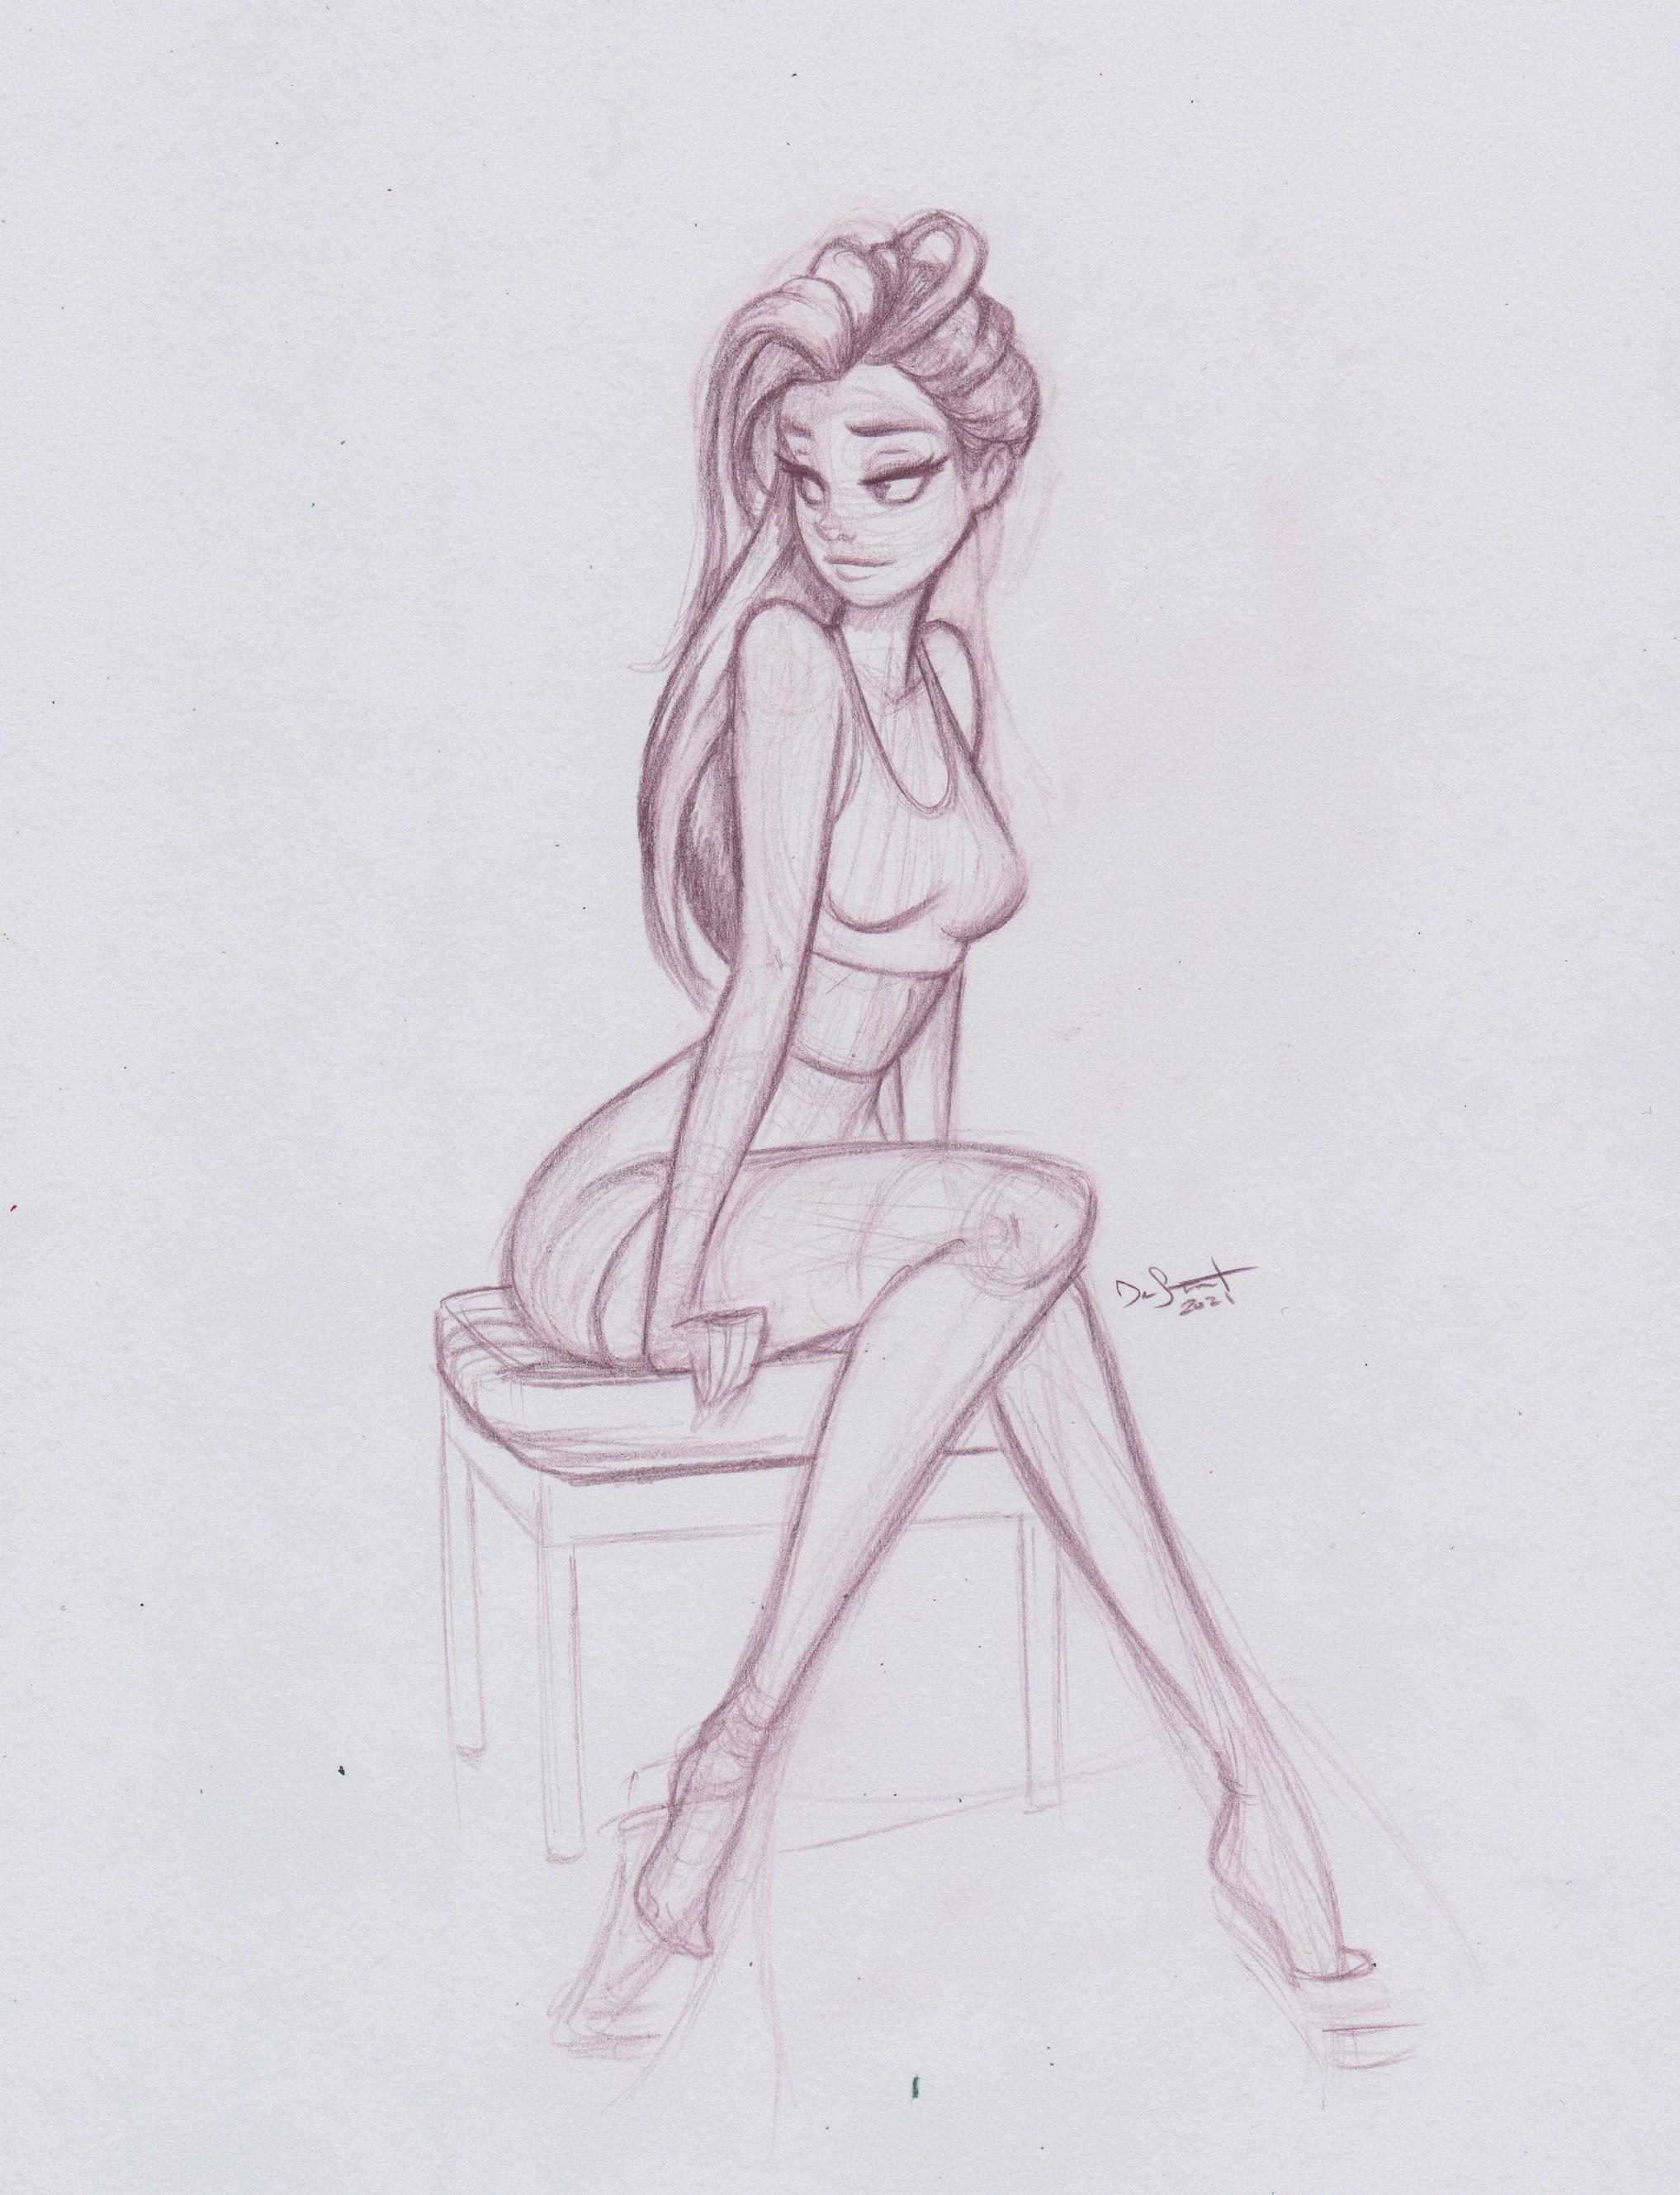 Original Pencil Sketch D. Stewart 2021